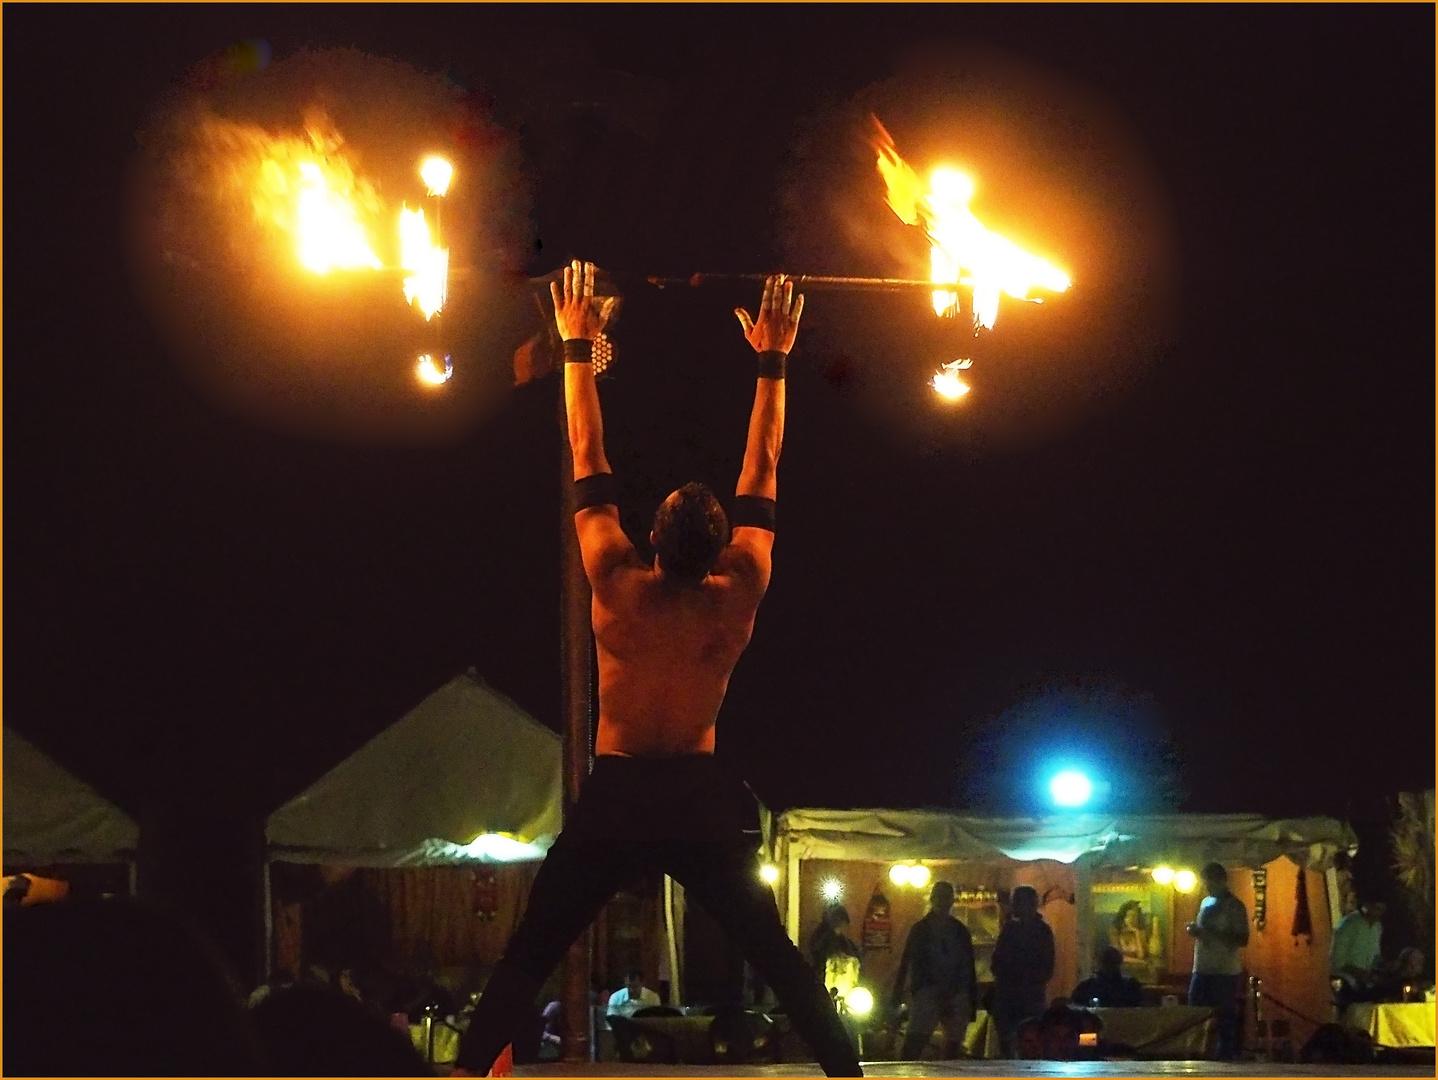 Cracheur / jongleur de feu